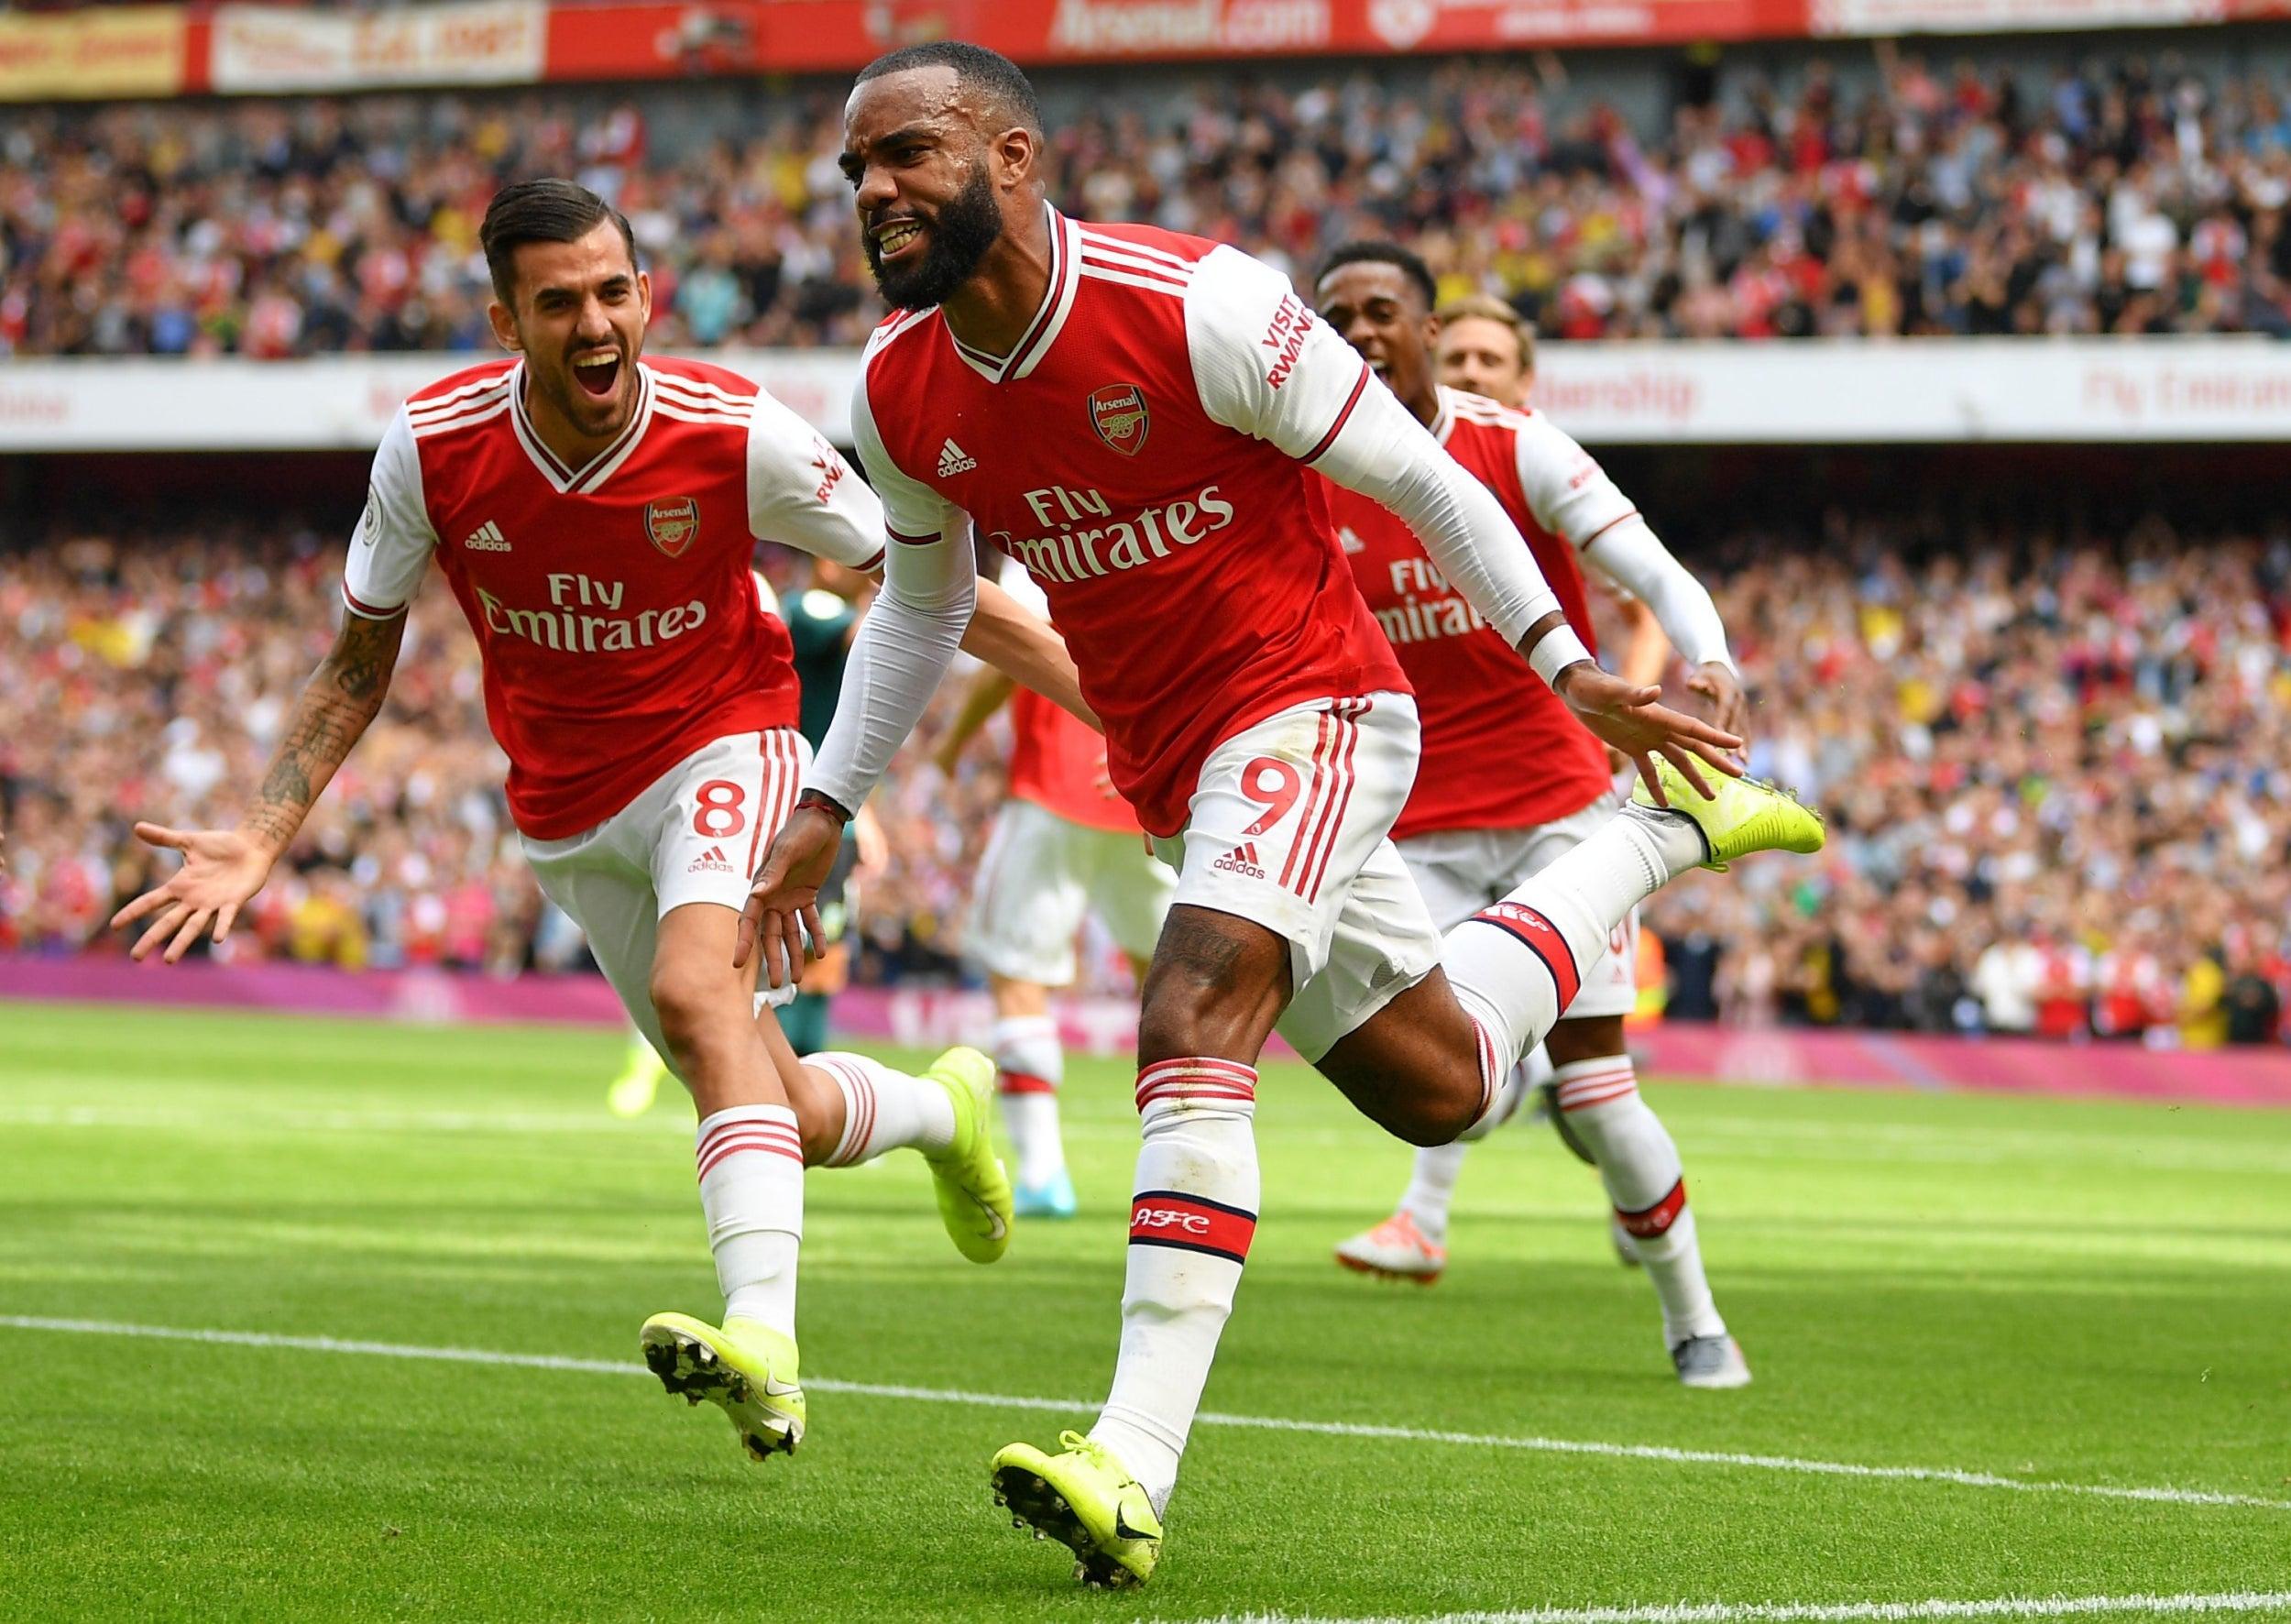 Arsenal Vs Burnley Live Stream 2019